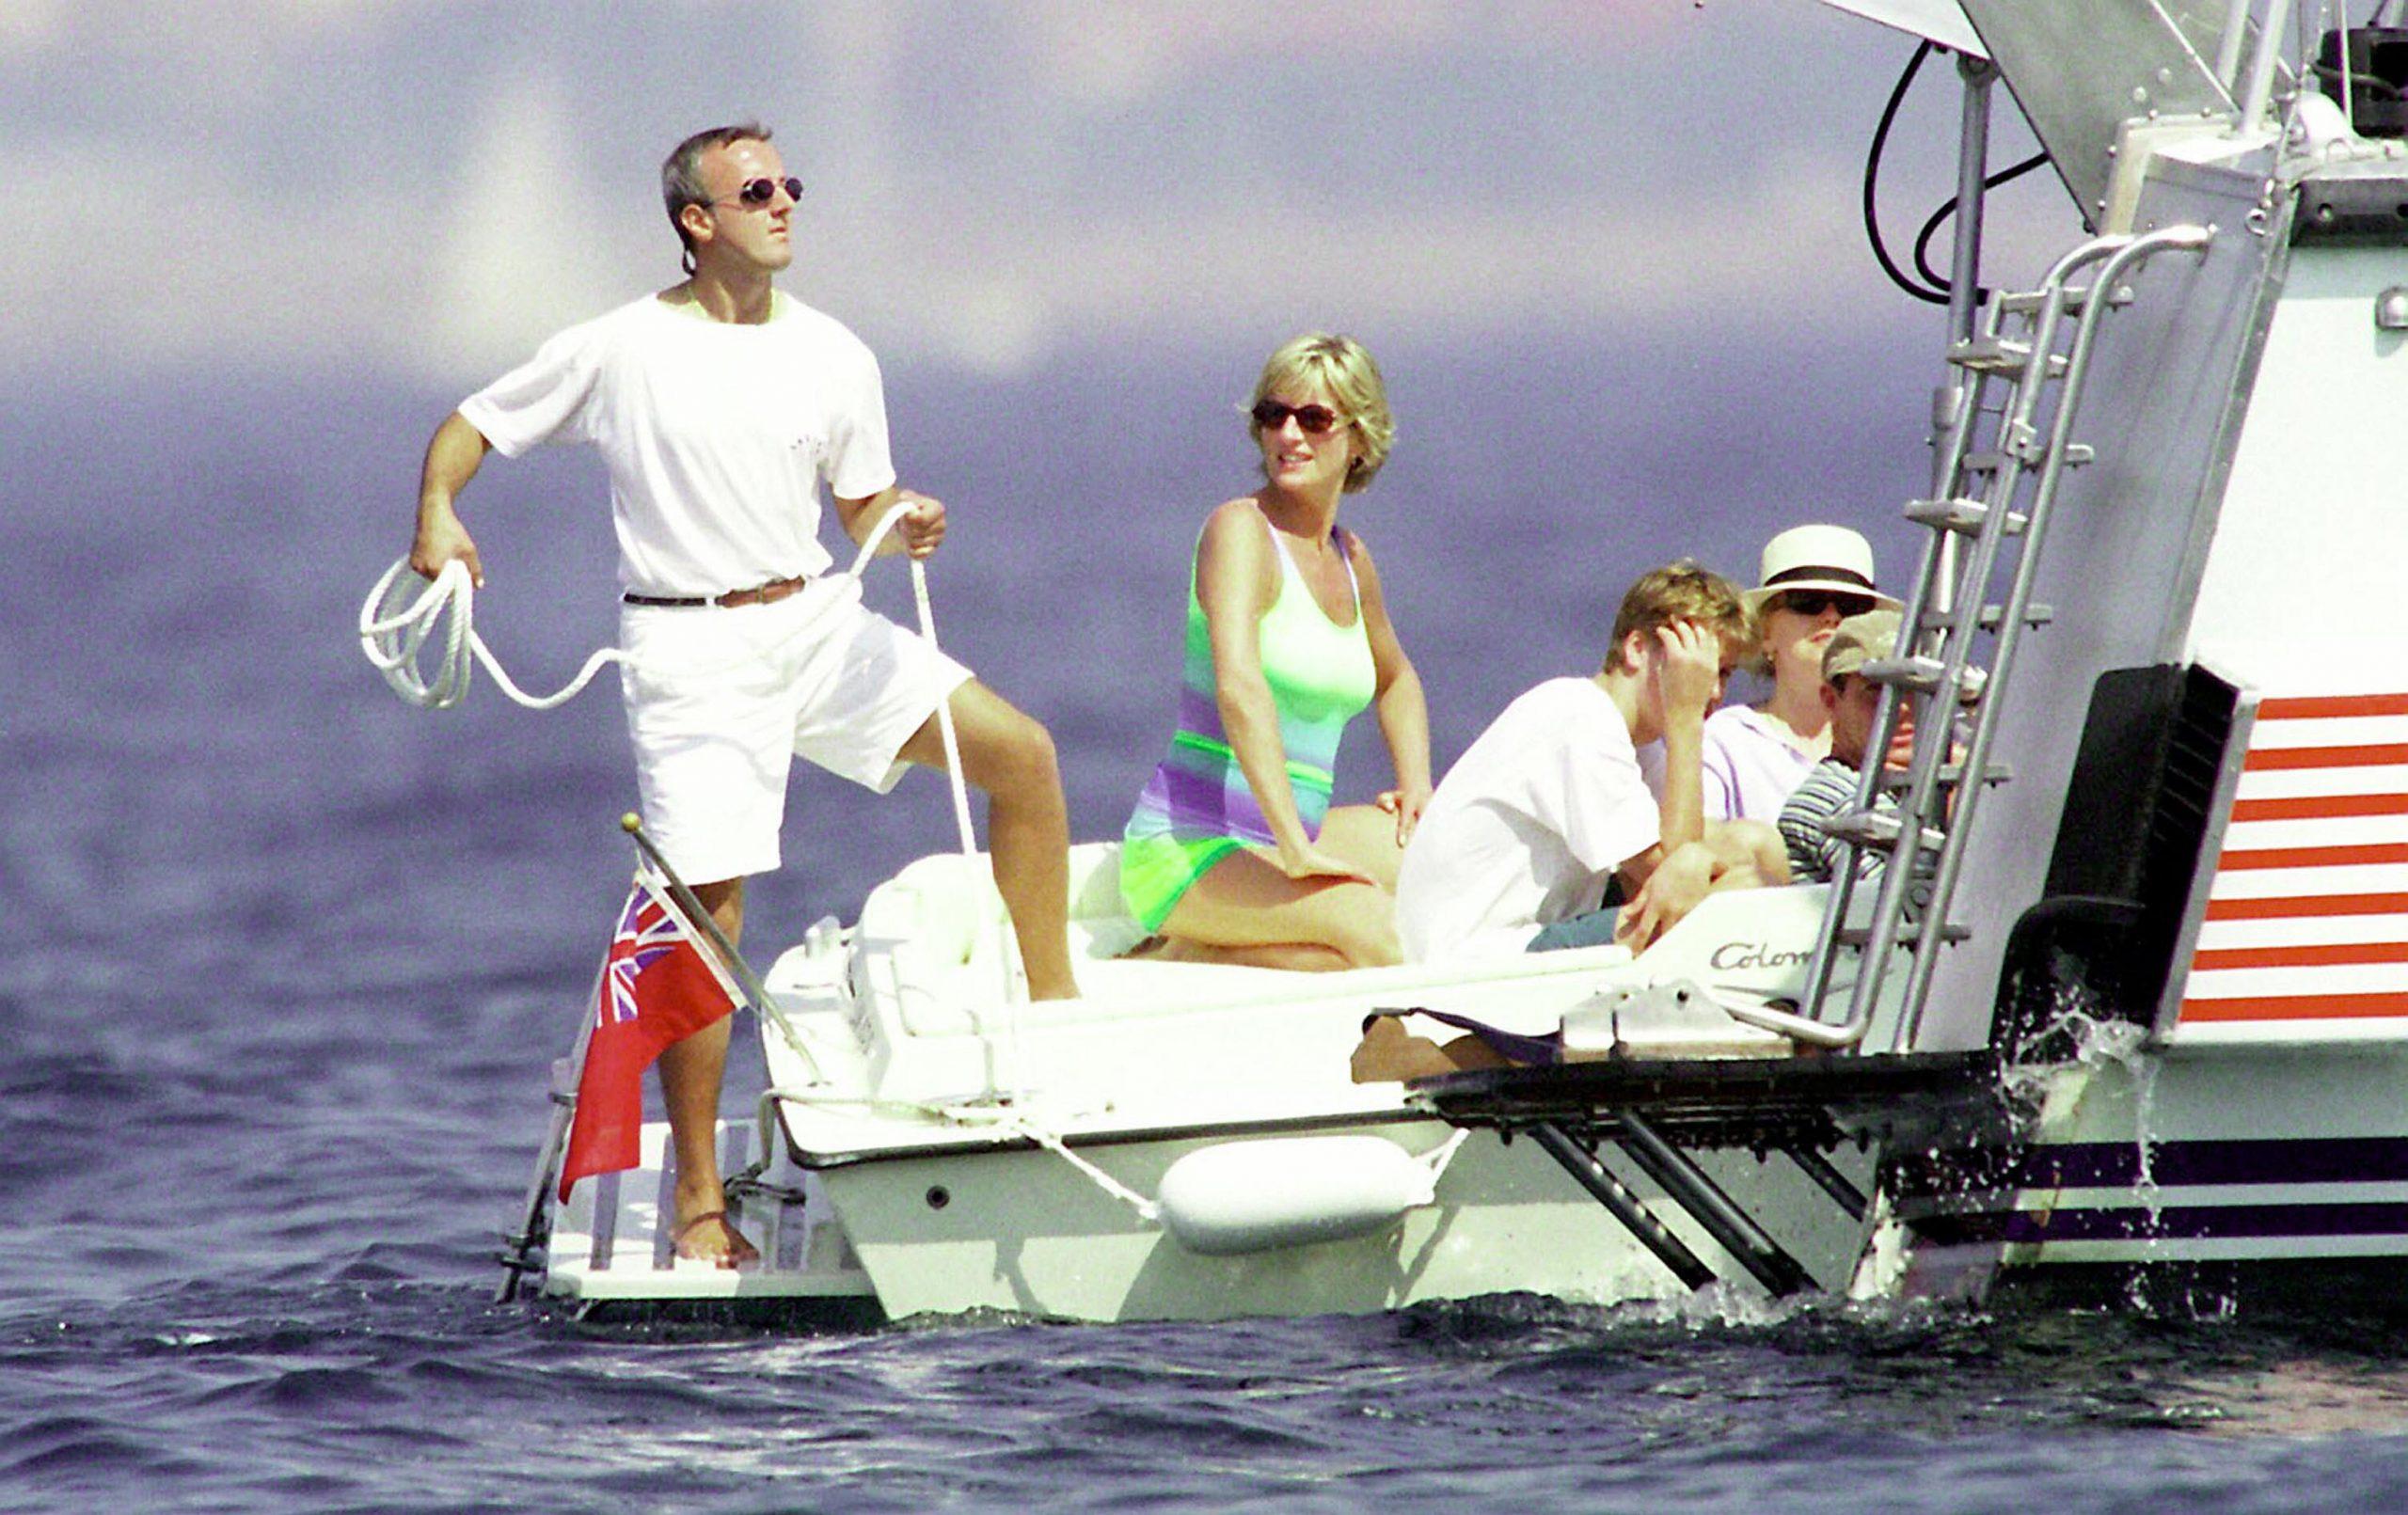 Diana and Dodi Al Fayed